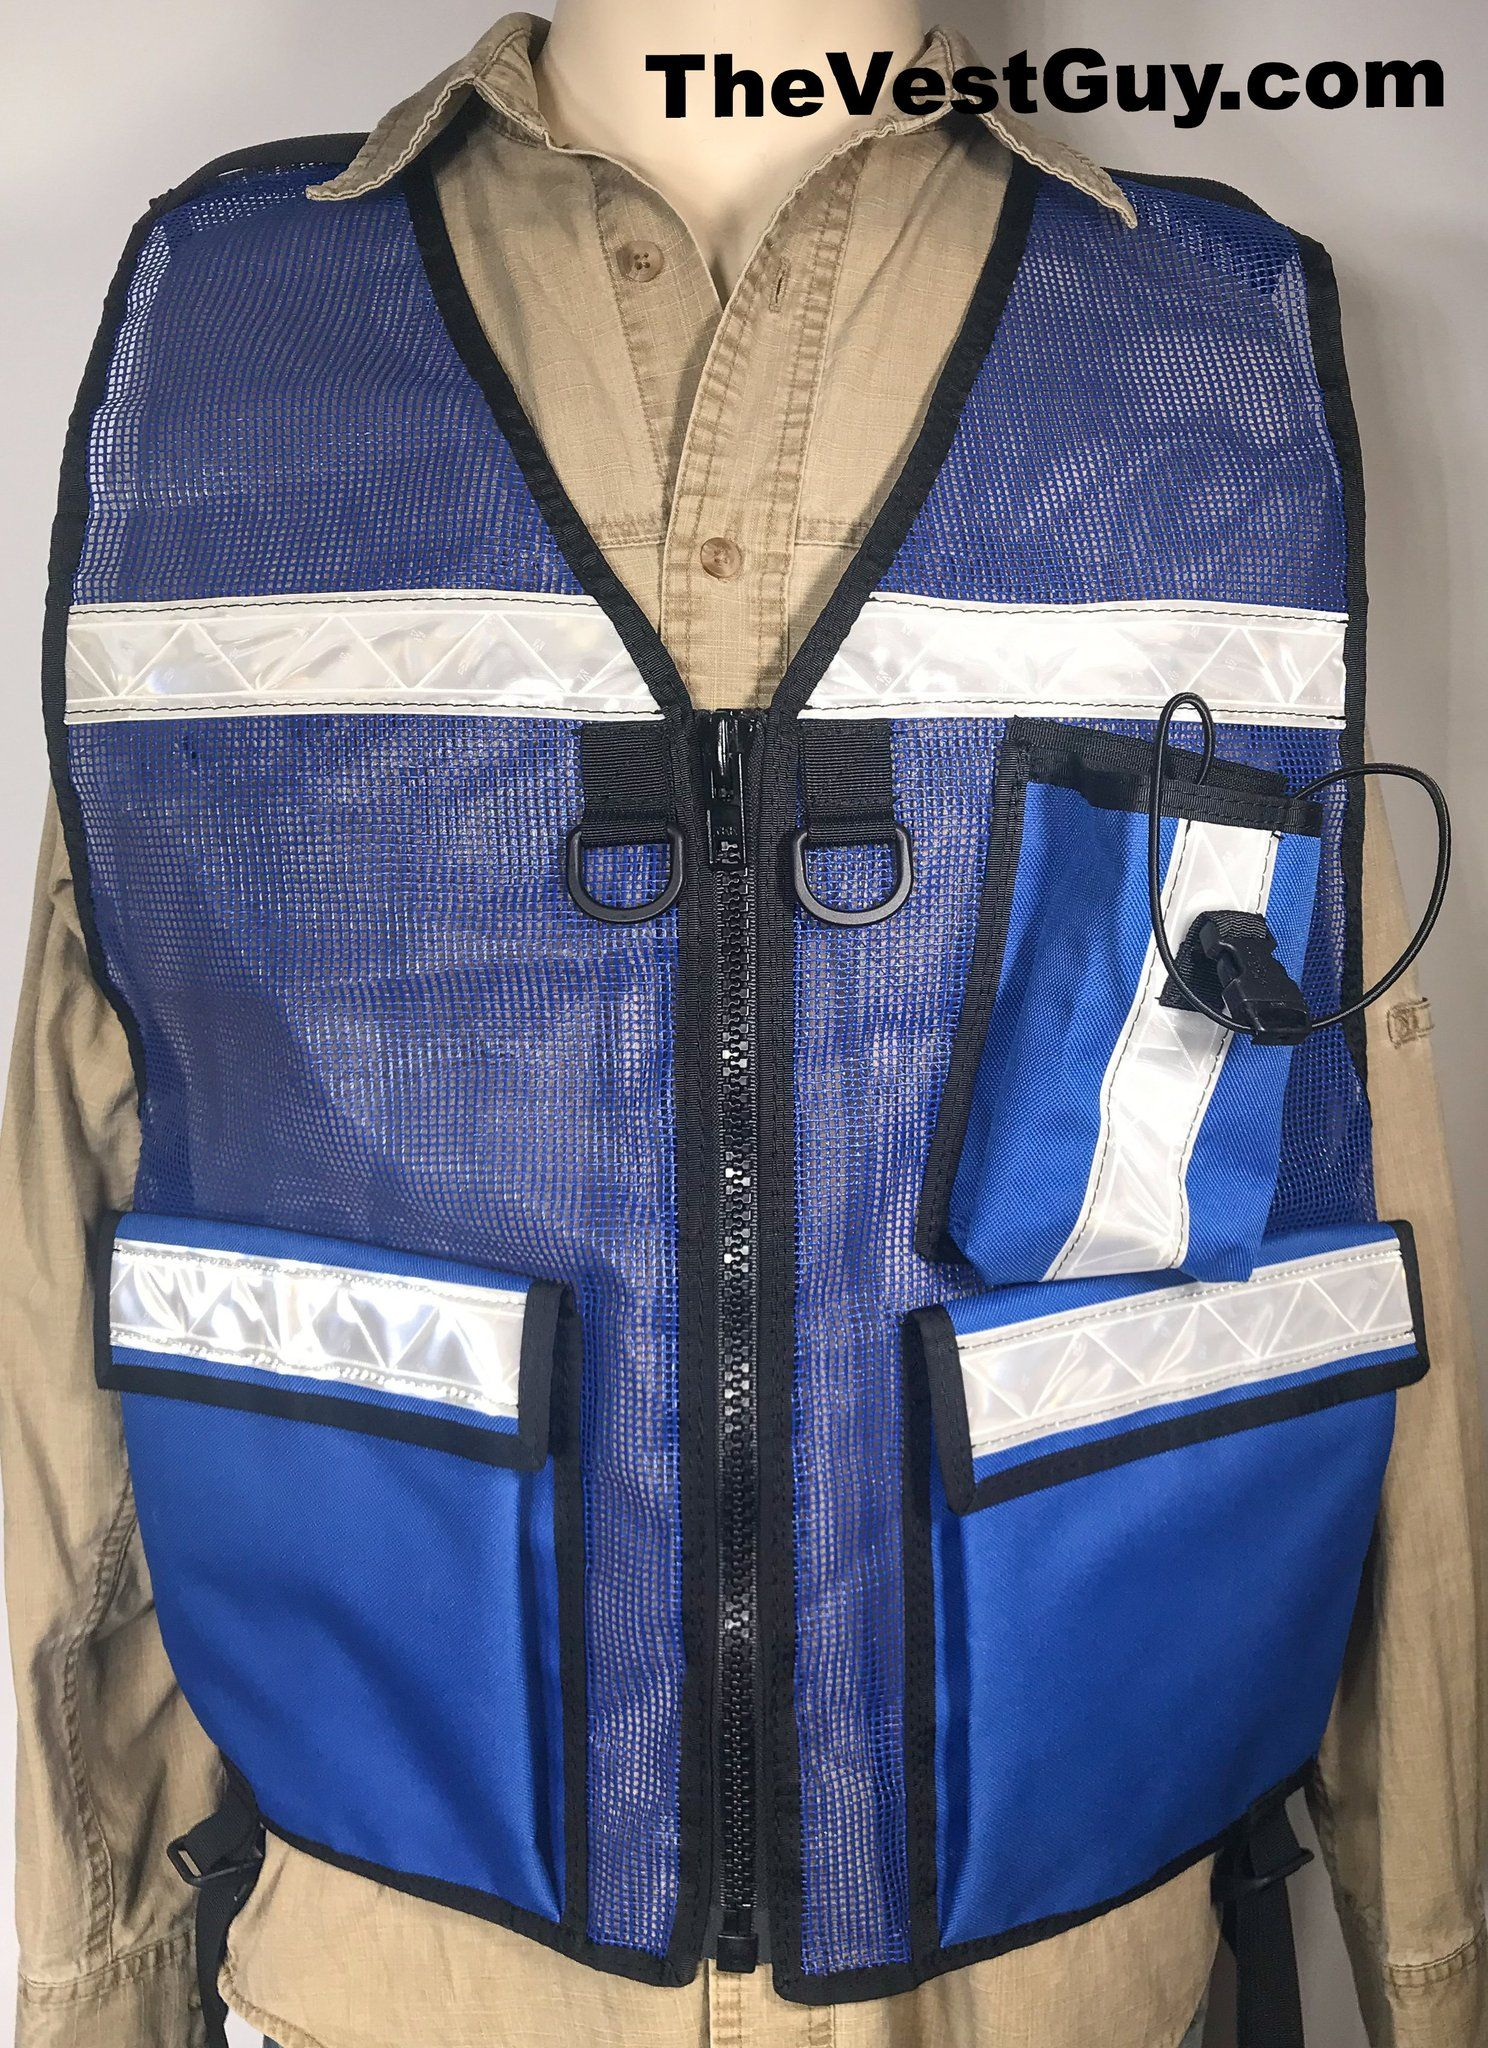 FRA Safety Reflective Vest with radio pocket ; Royal Blue